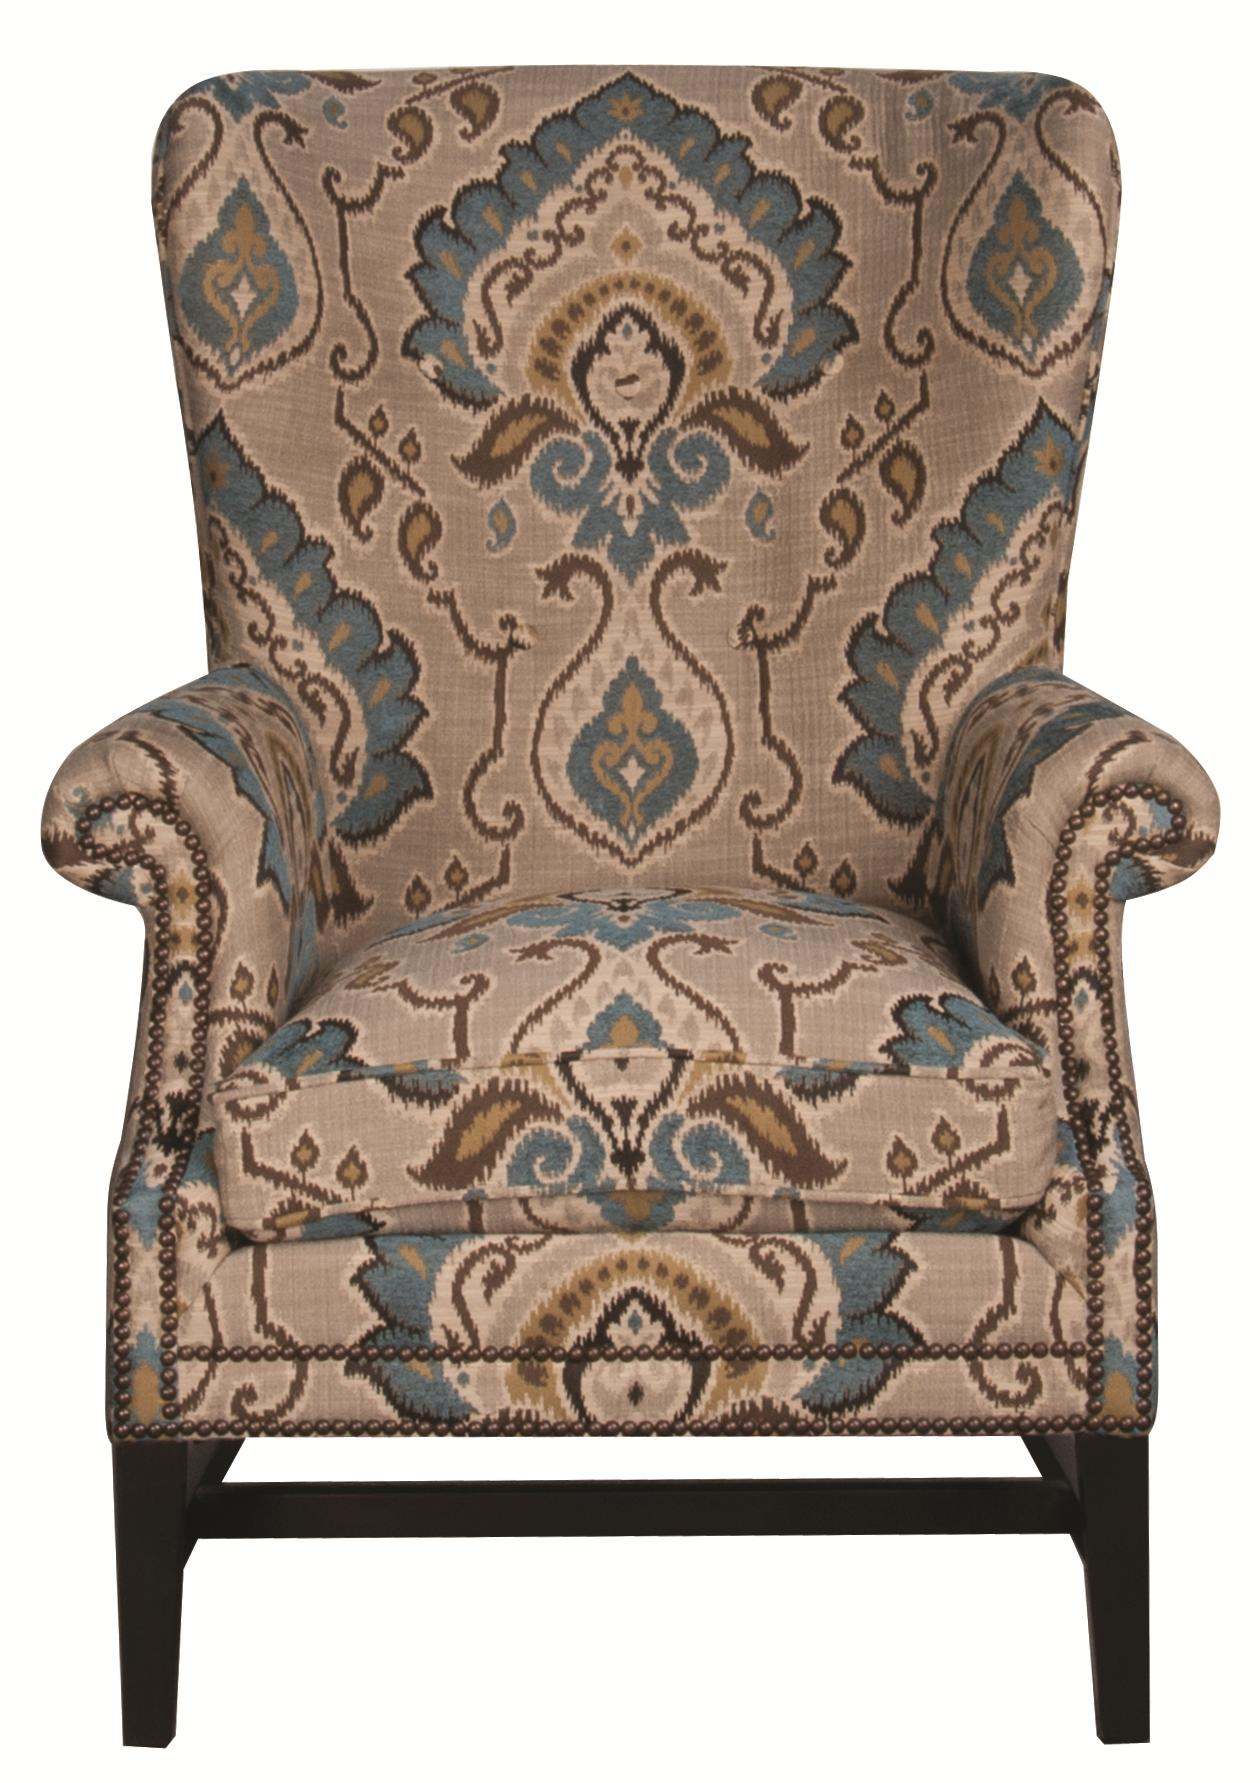 Bernhardt Joslyn Joslyn Accent Chair - Item Number: 110255595